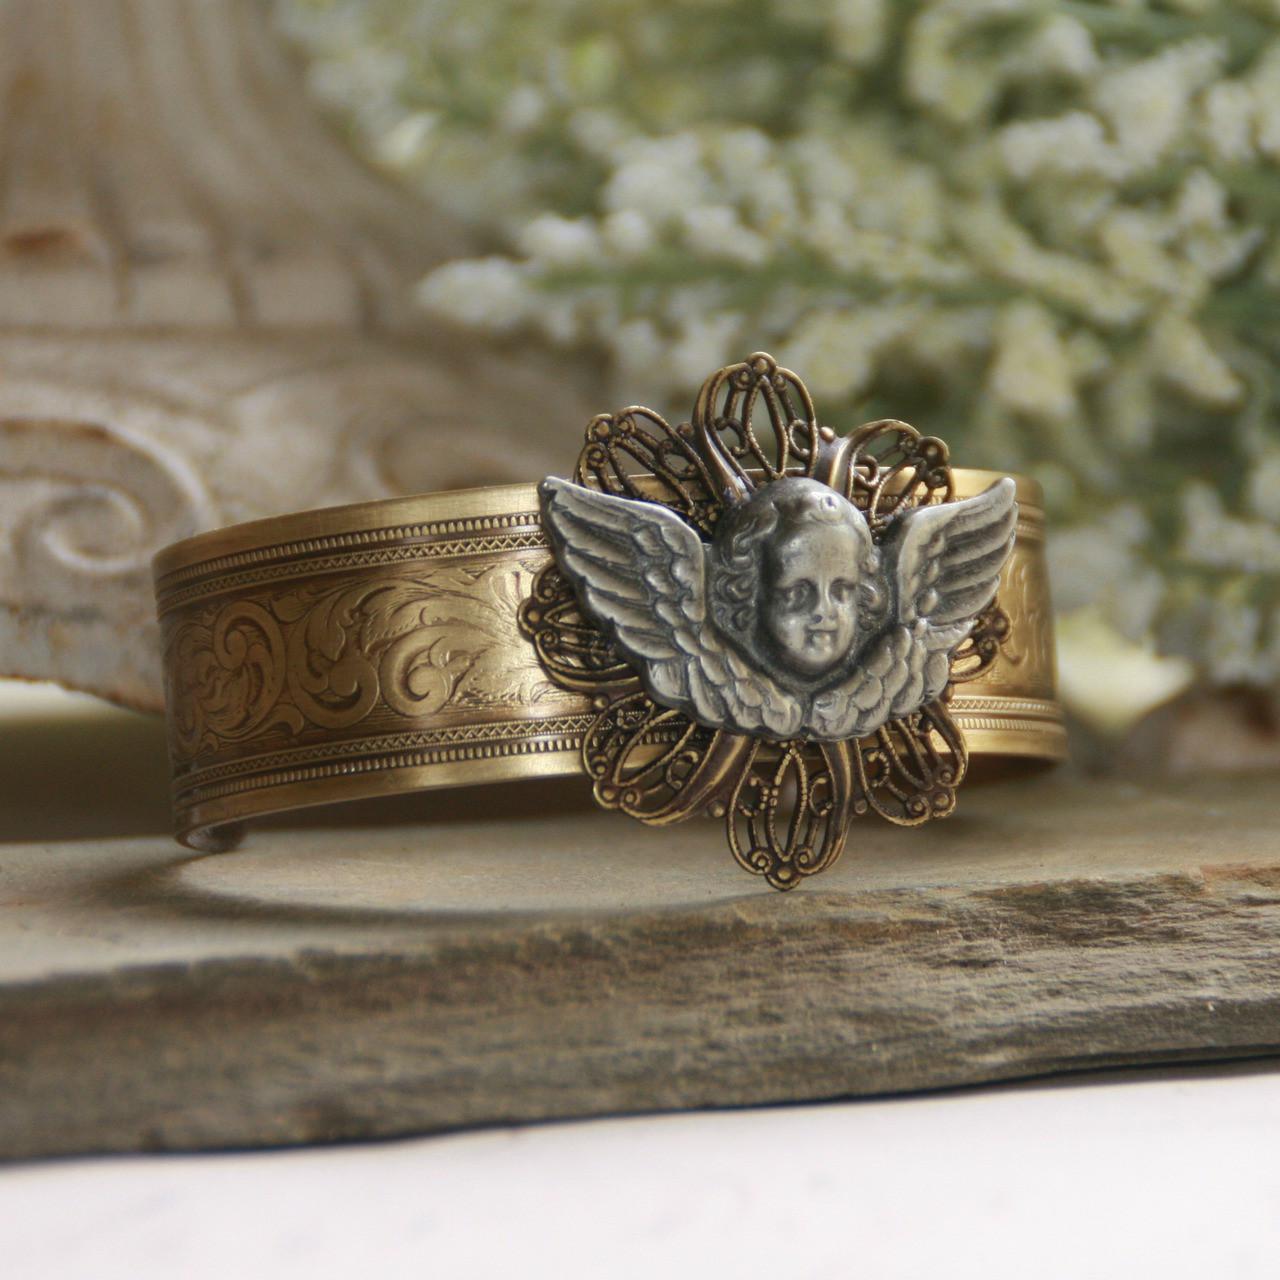 ART-144 A Sweet Angel to Watch Over You Cuff Bracelet